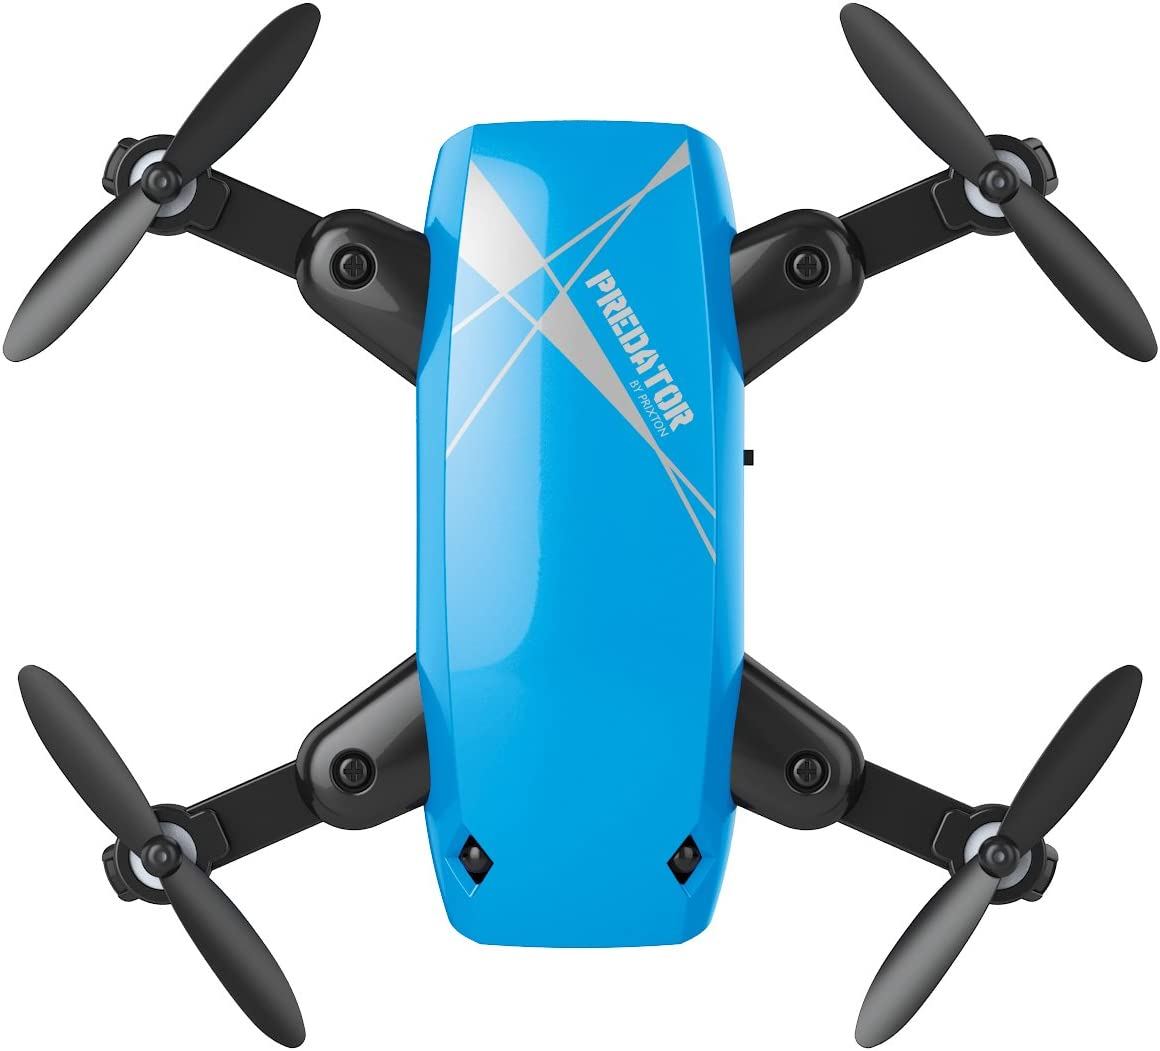 PRIXTON- Drone DR200 Selfie Predator, Cámara Wi-Fi, Color Azul (DR200PREDATORSELFIE)